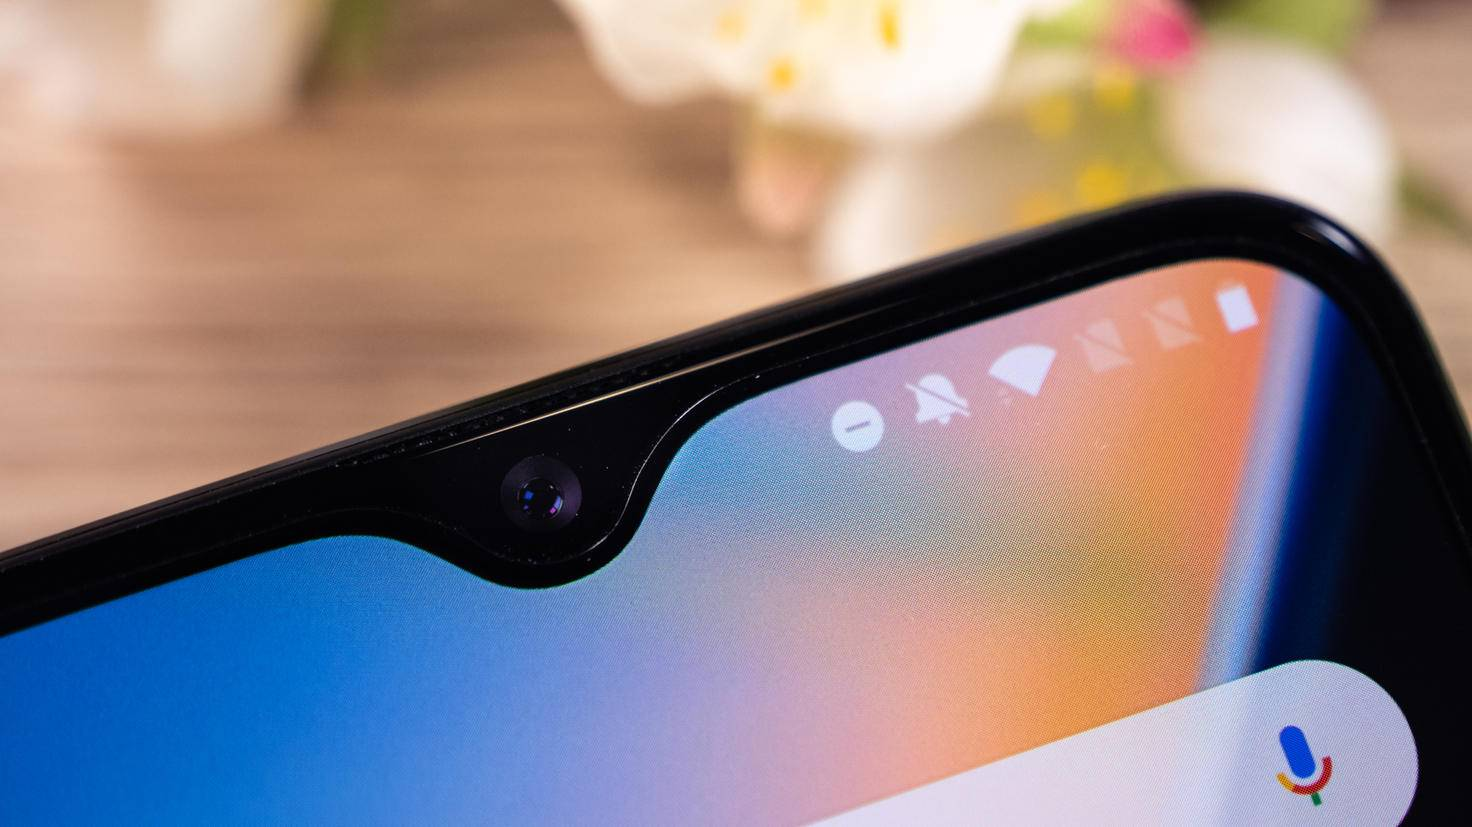 OnePlus-6T-TURN-ON-10